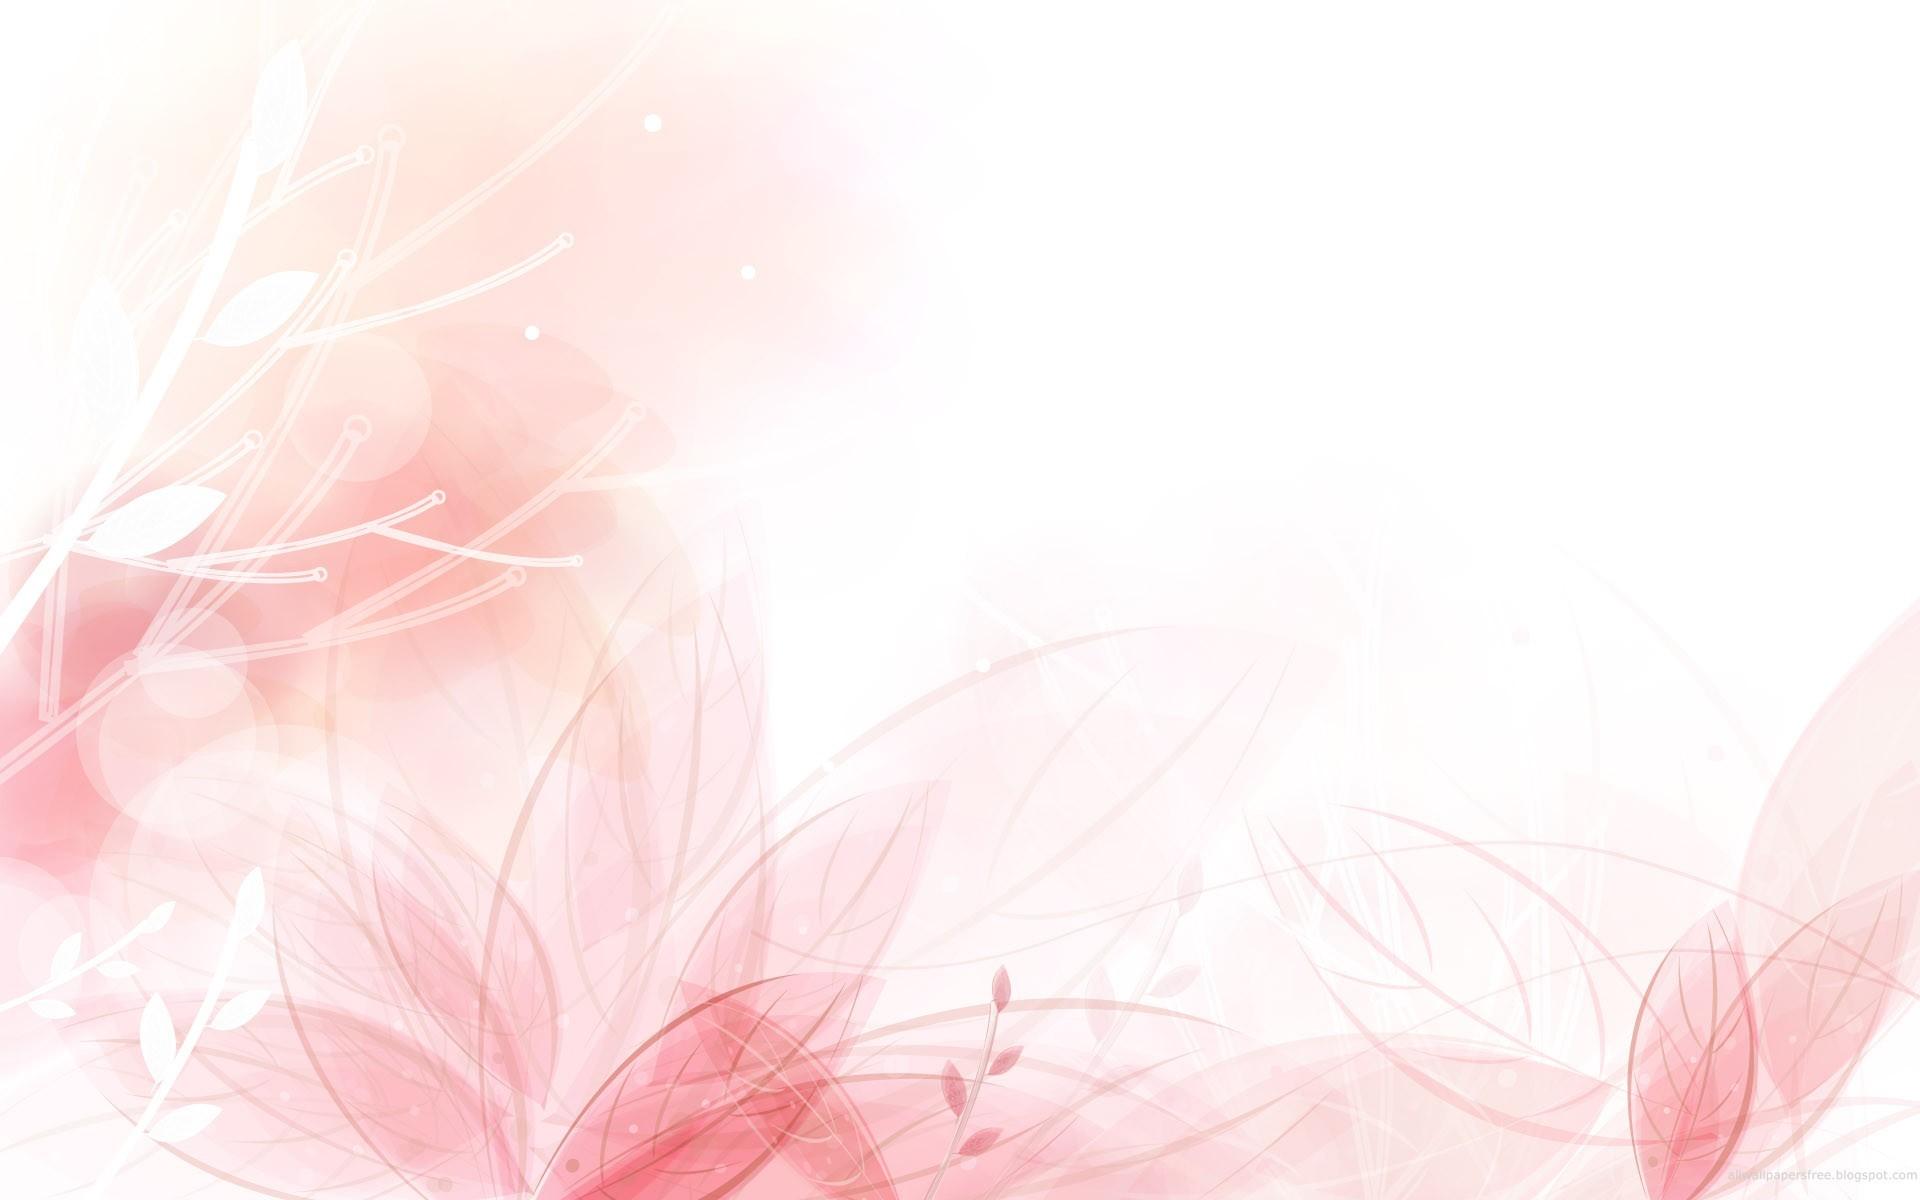 powerpoint background pink - Thebeerengine.co